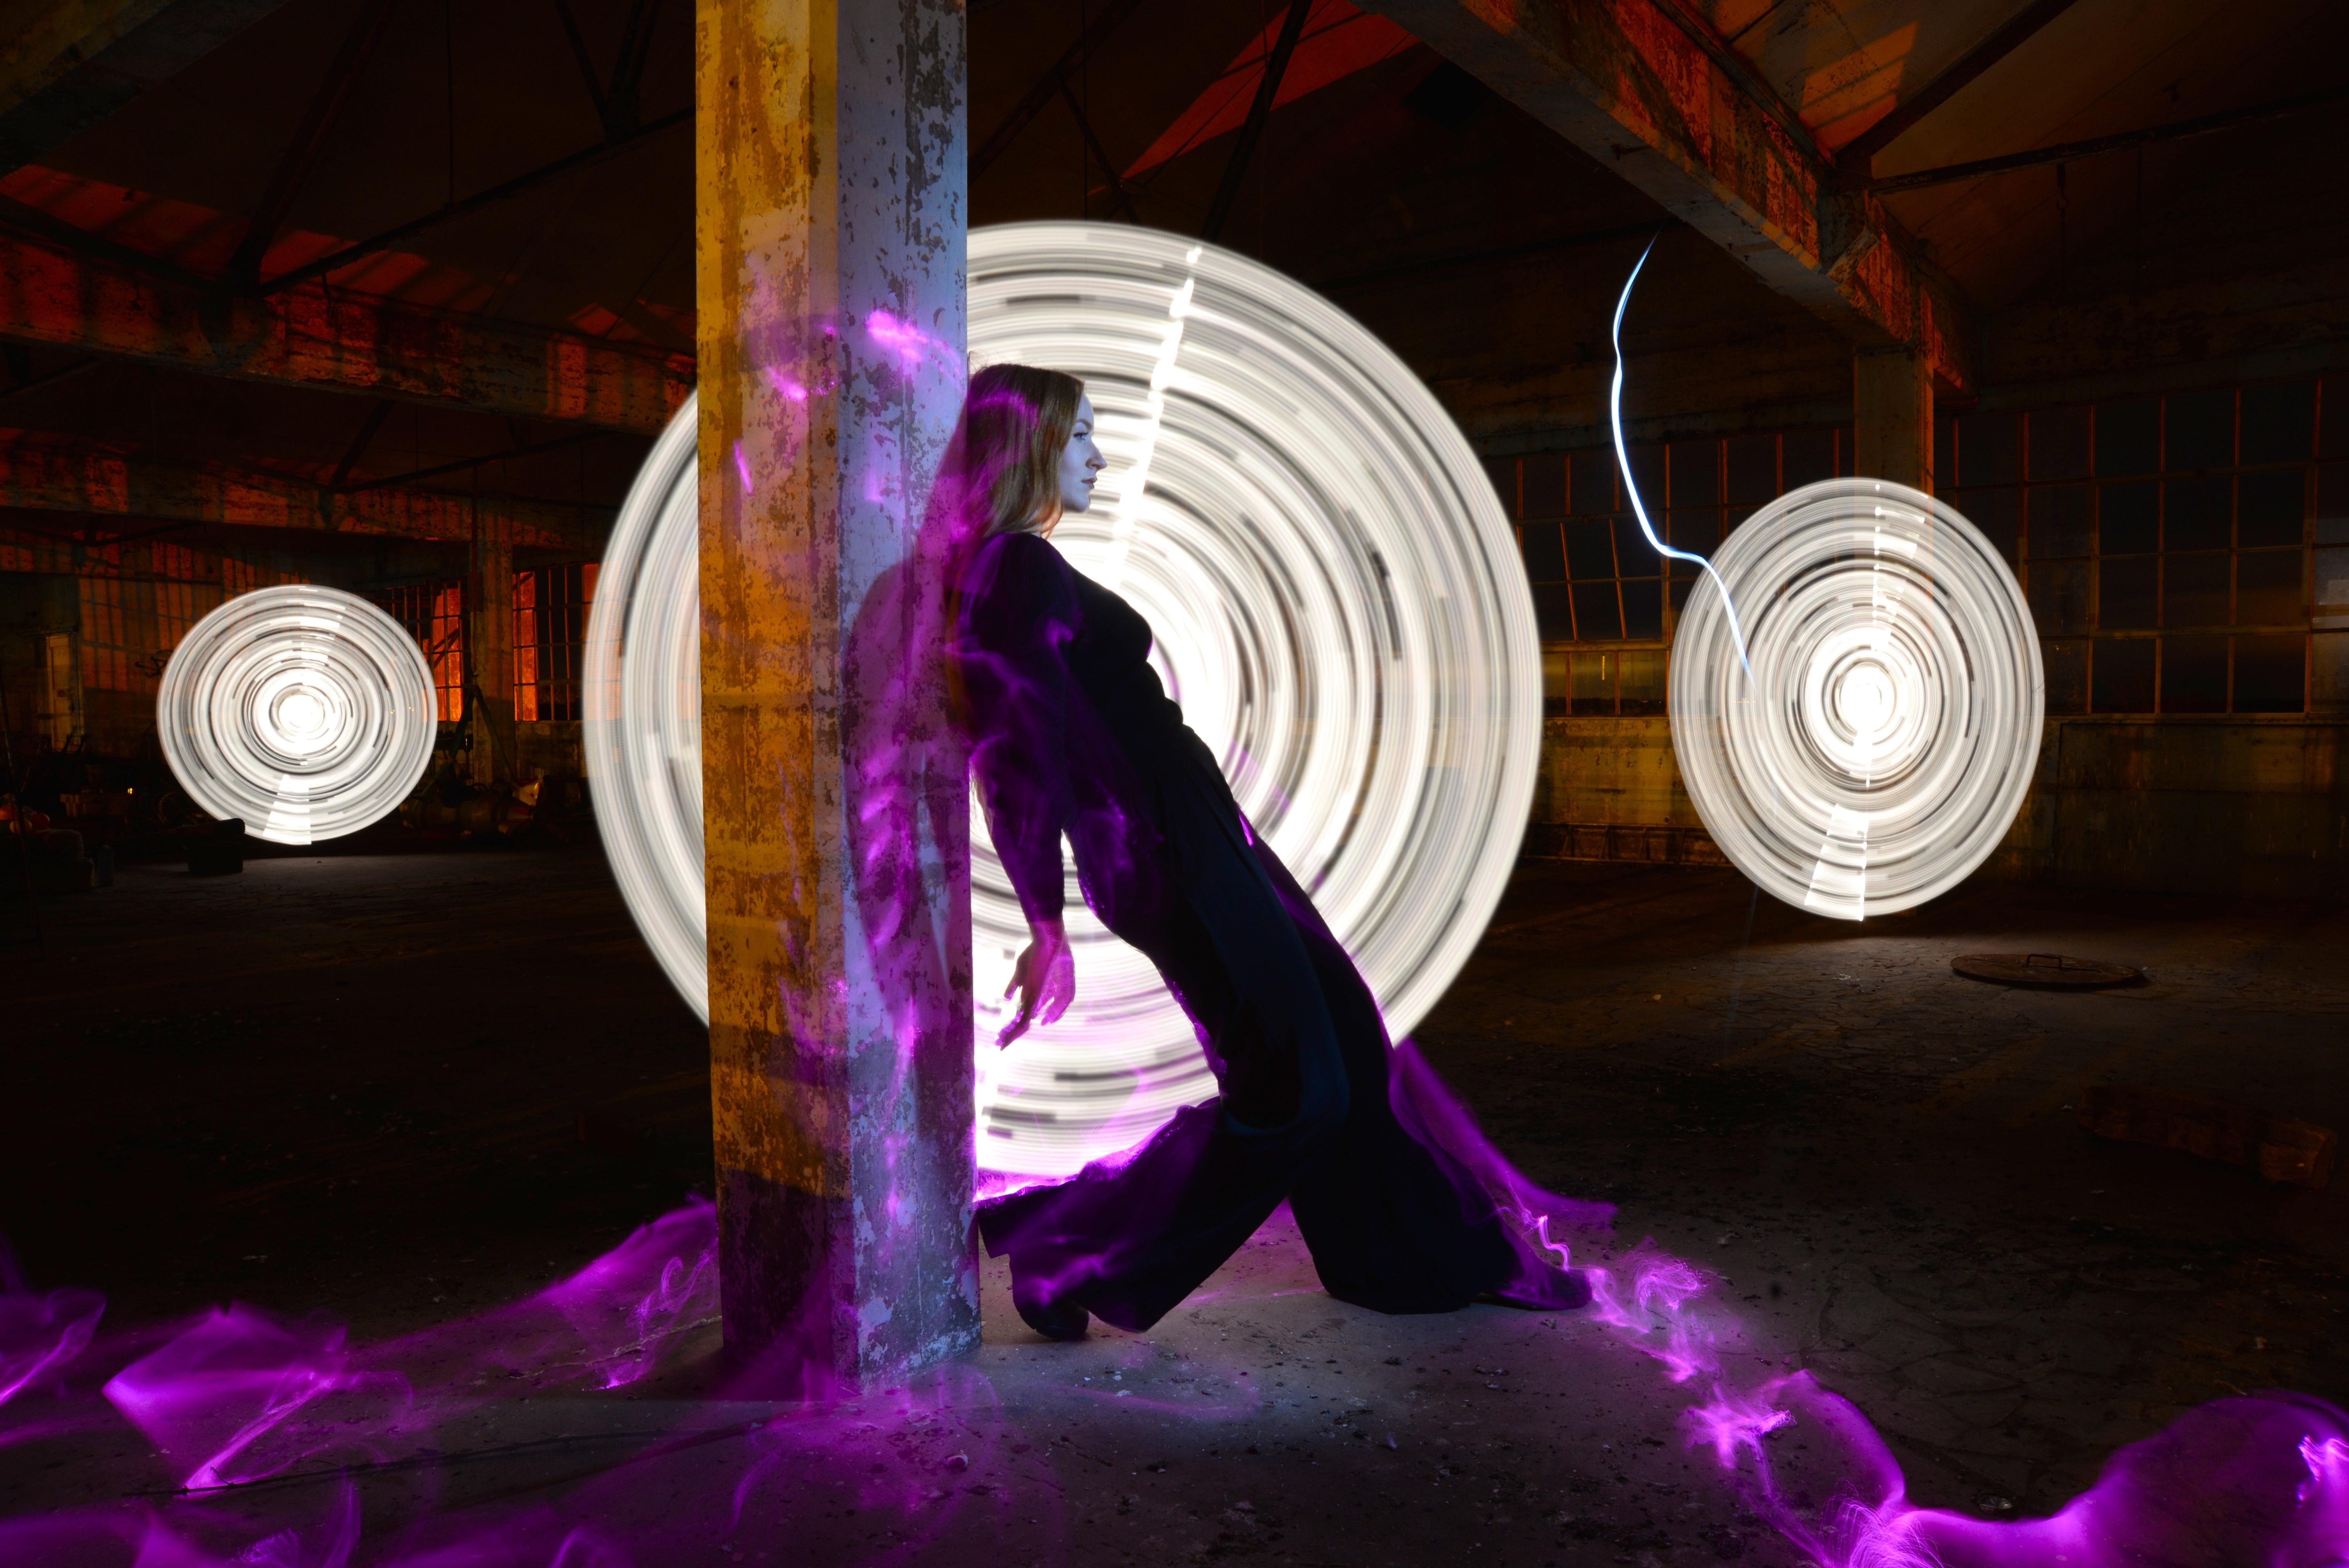 freya purple circles pixelstick light painting .jpg